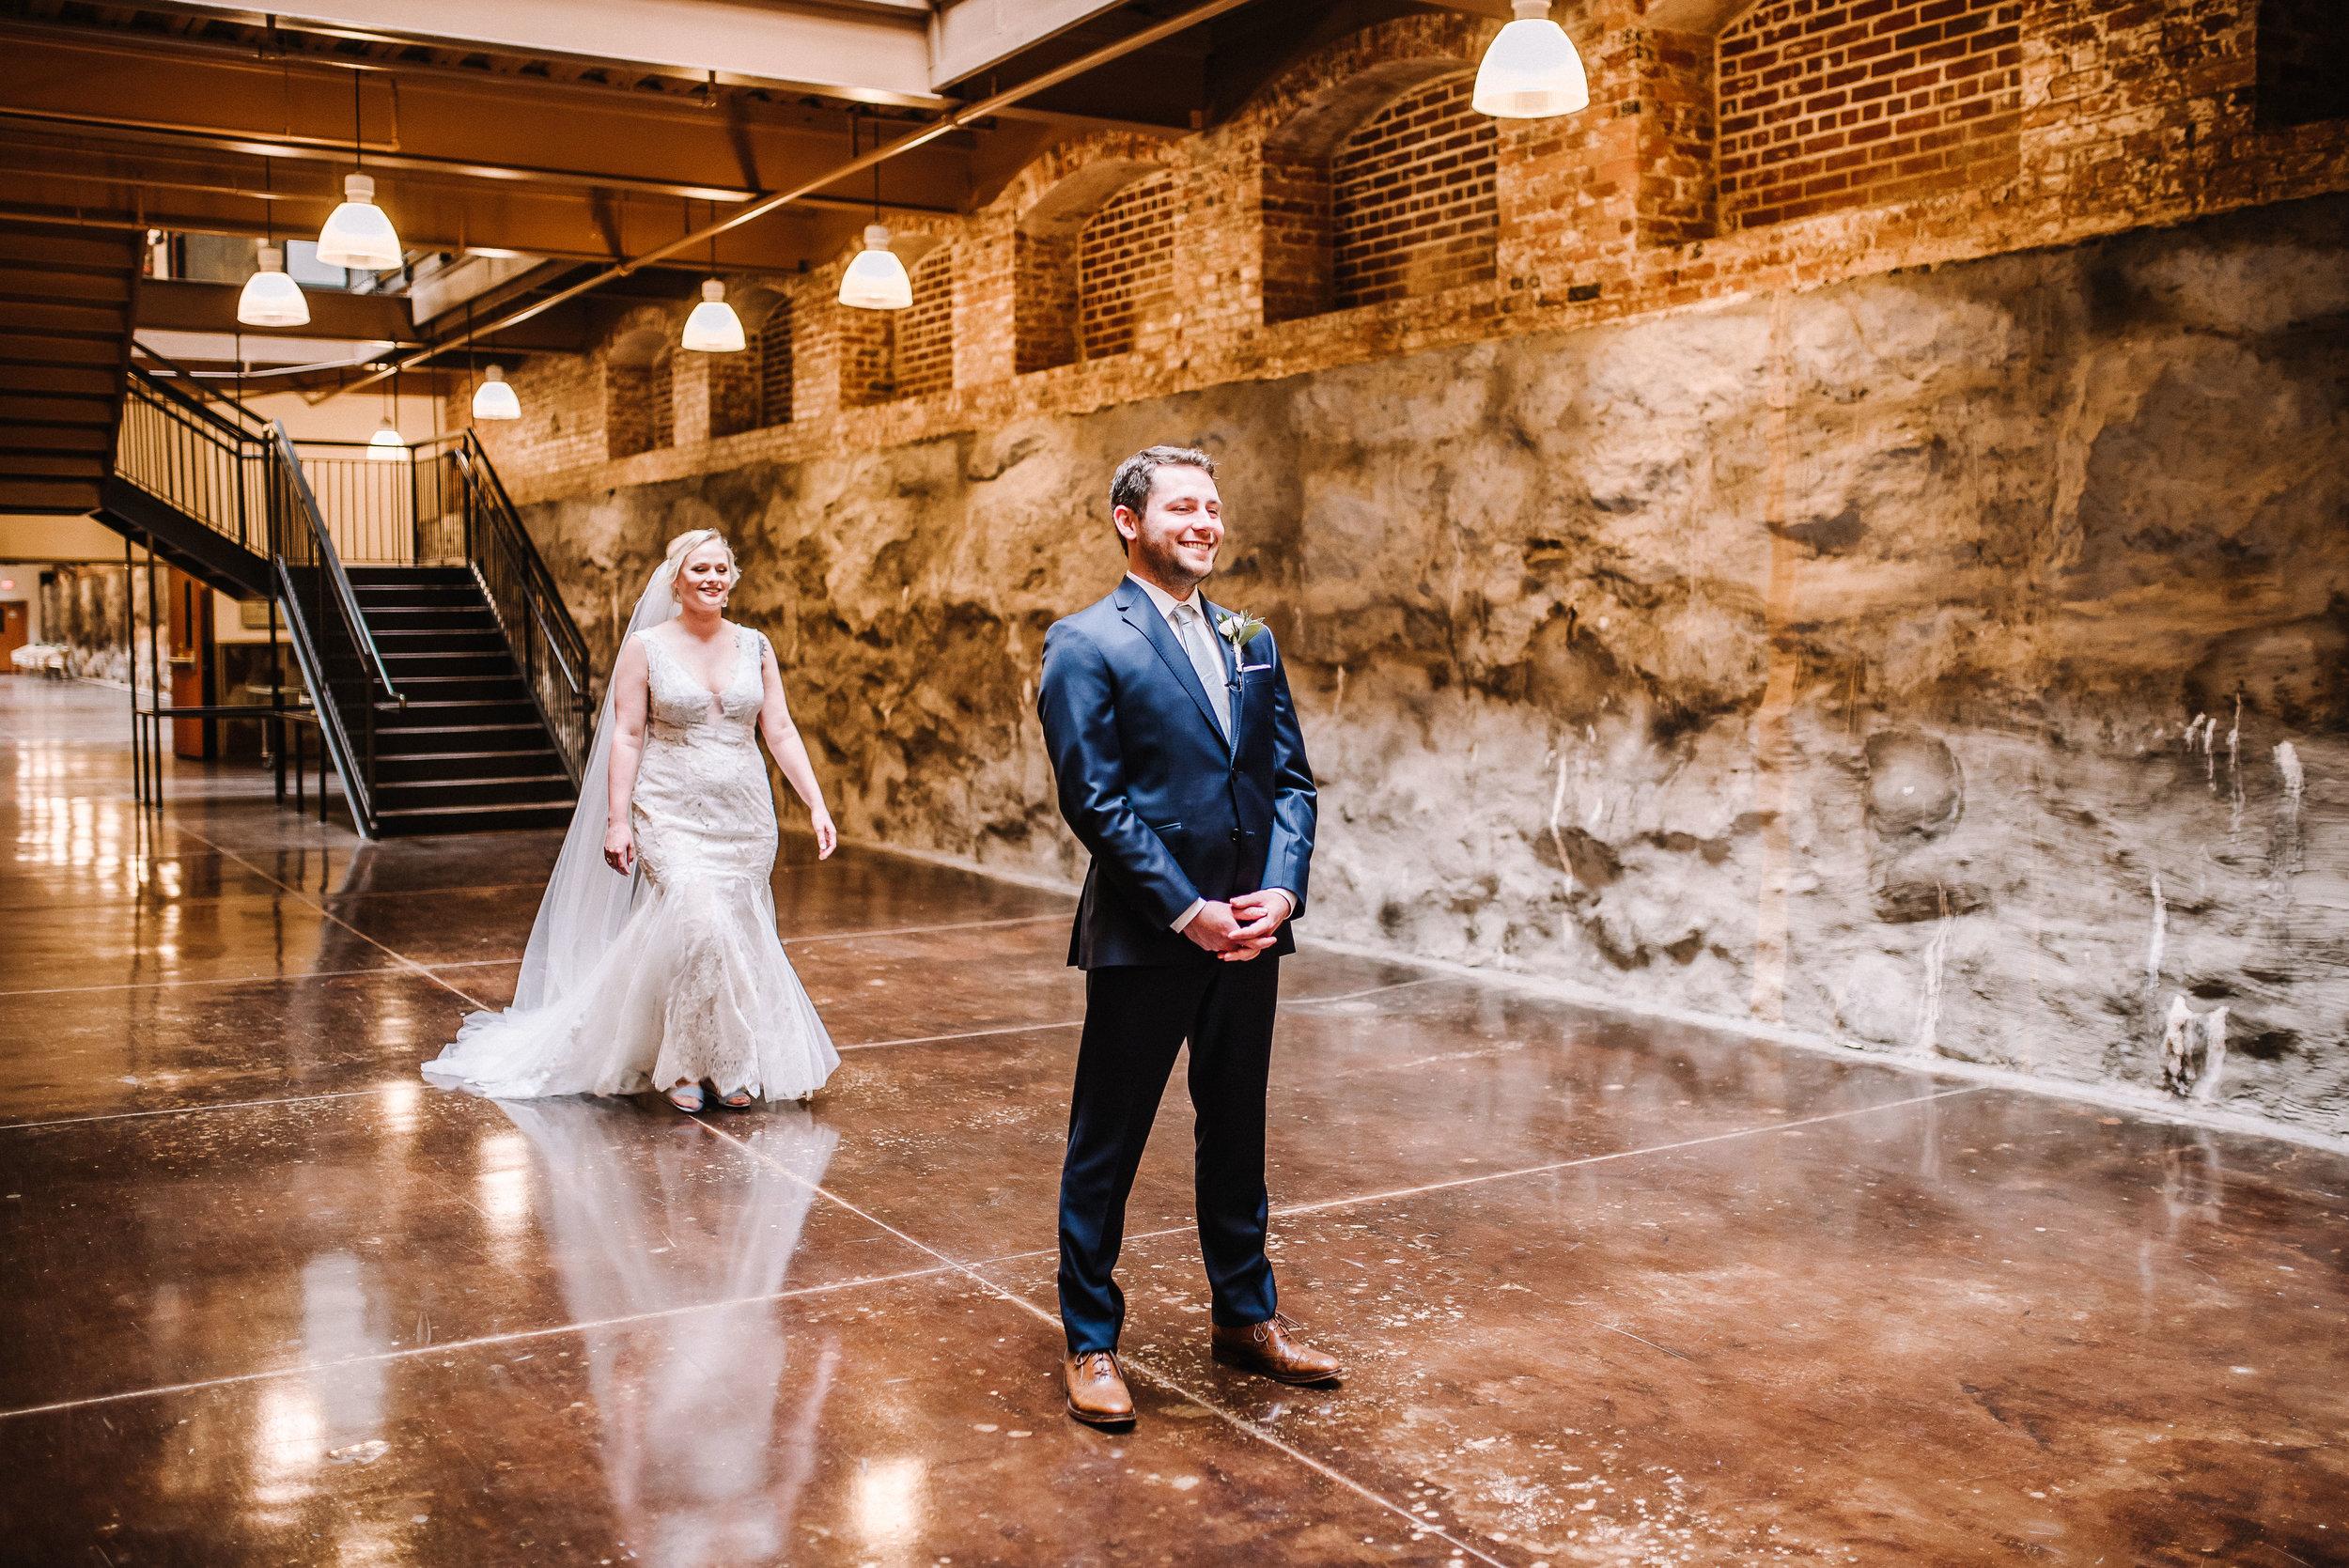 Morgan Wedding_Mill at Yellow River_Ashley Benham Photography-278.jpg